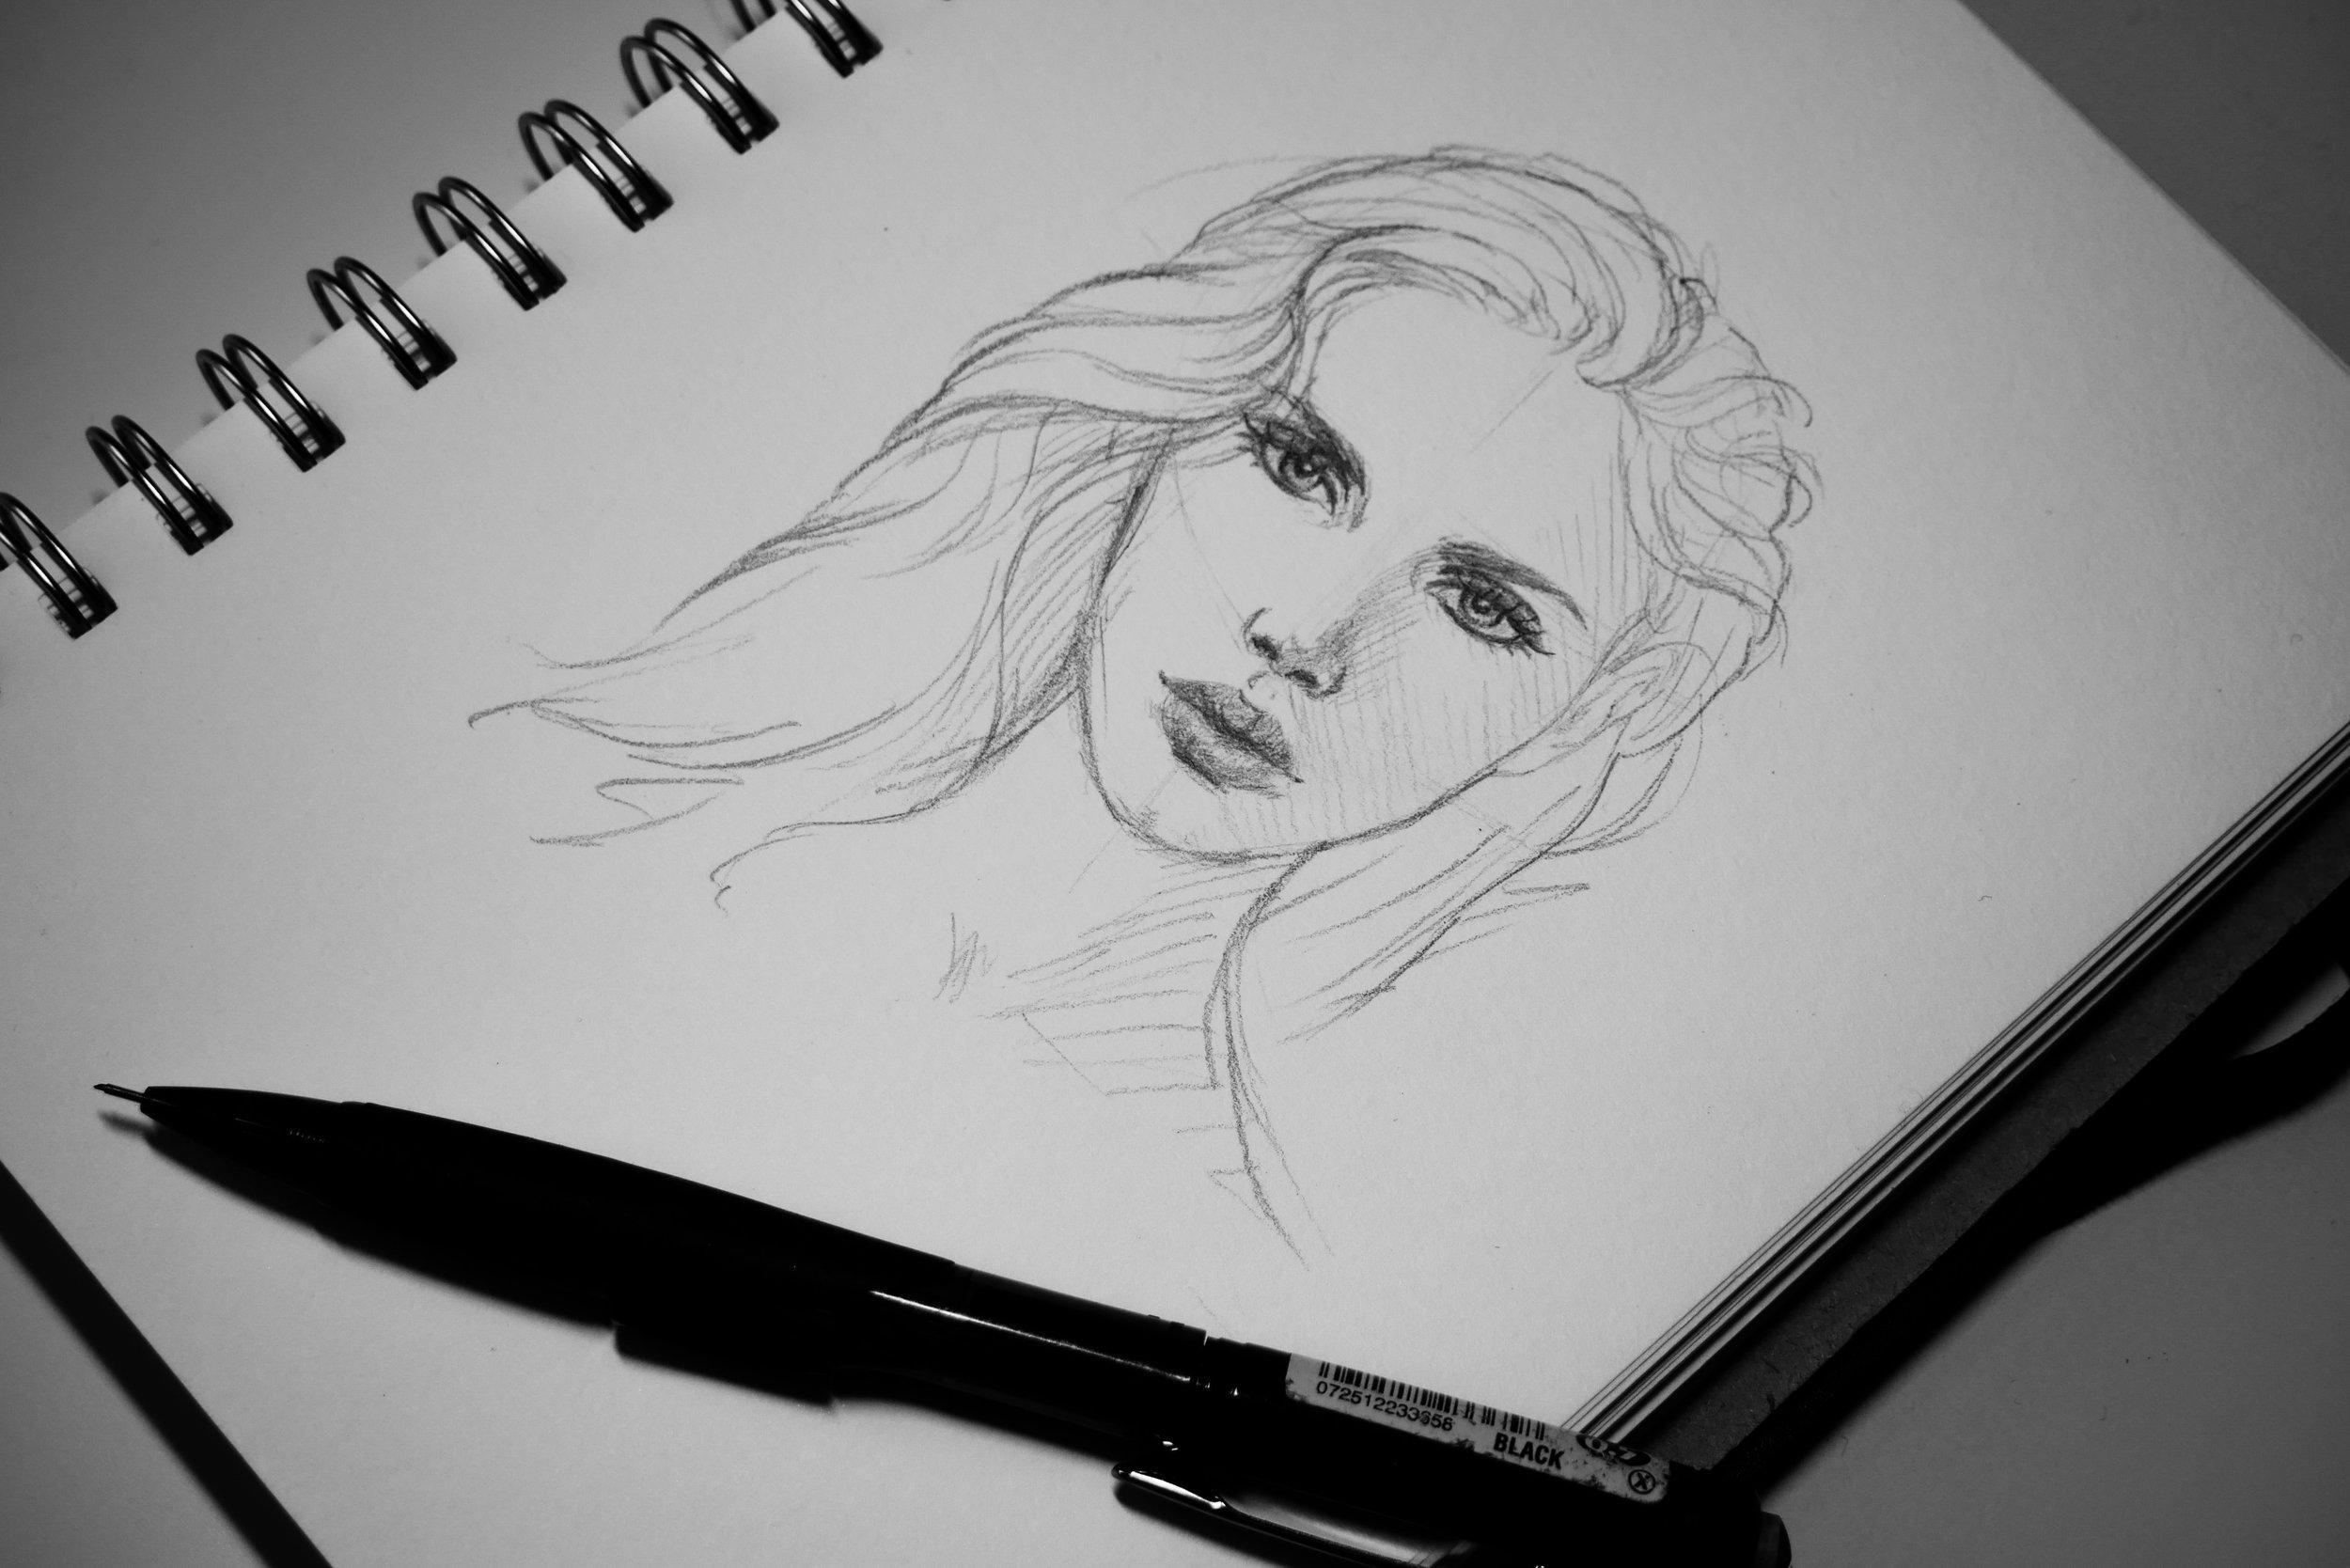 PortraitSketch_July2017_by_HannahMarshall